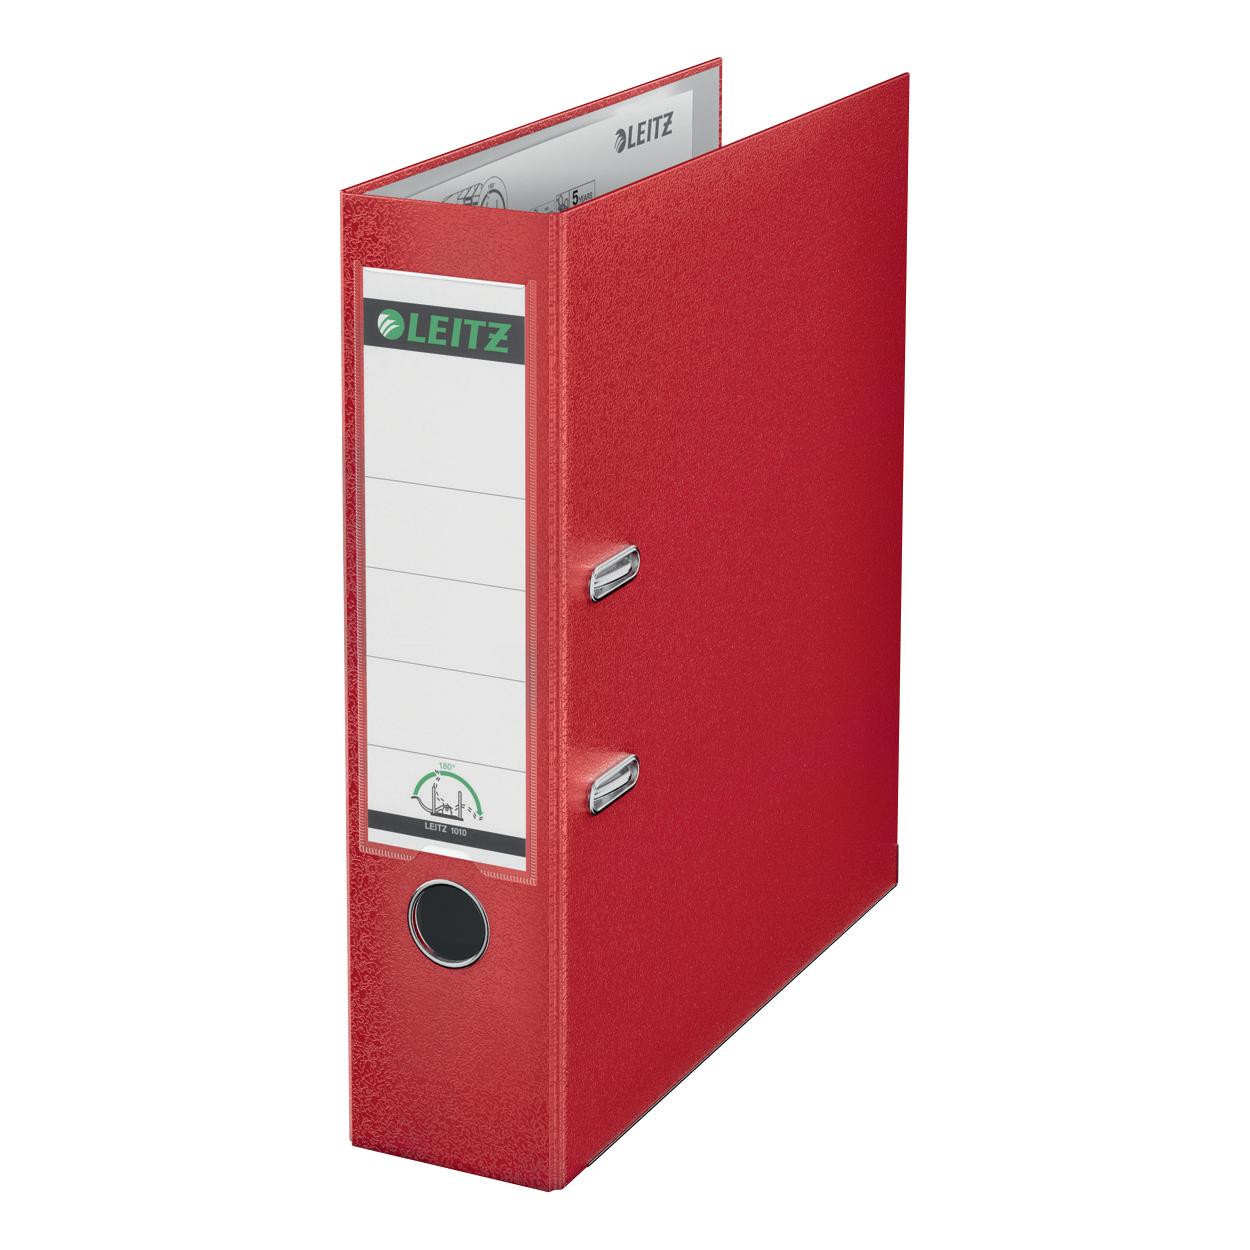 Leitz FSC Lever Arch File Plastic 80mm Spine Foolscap Red Ref 11101025 [Pack 10]